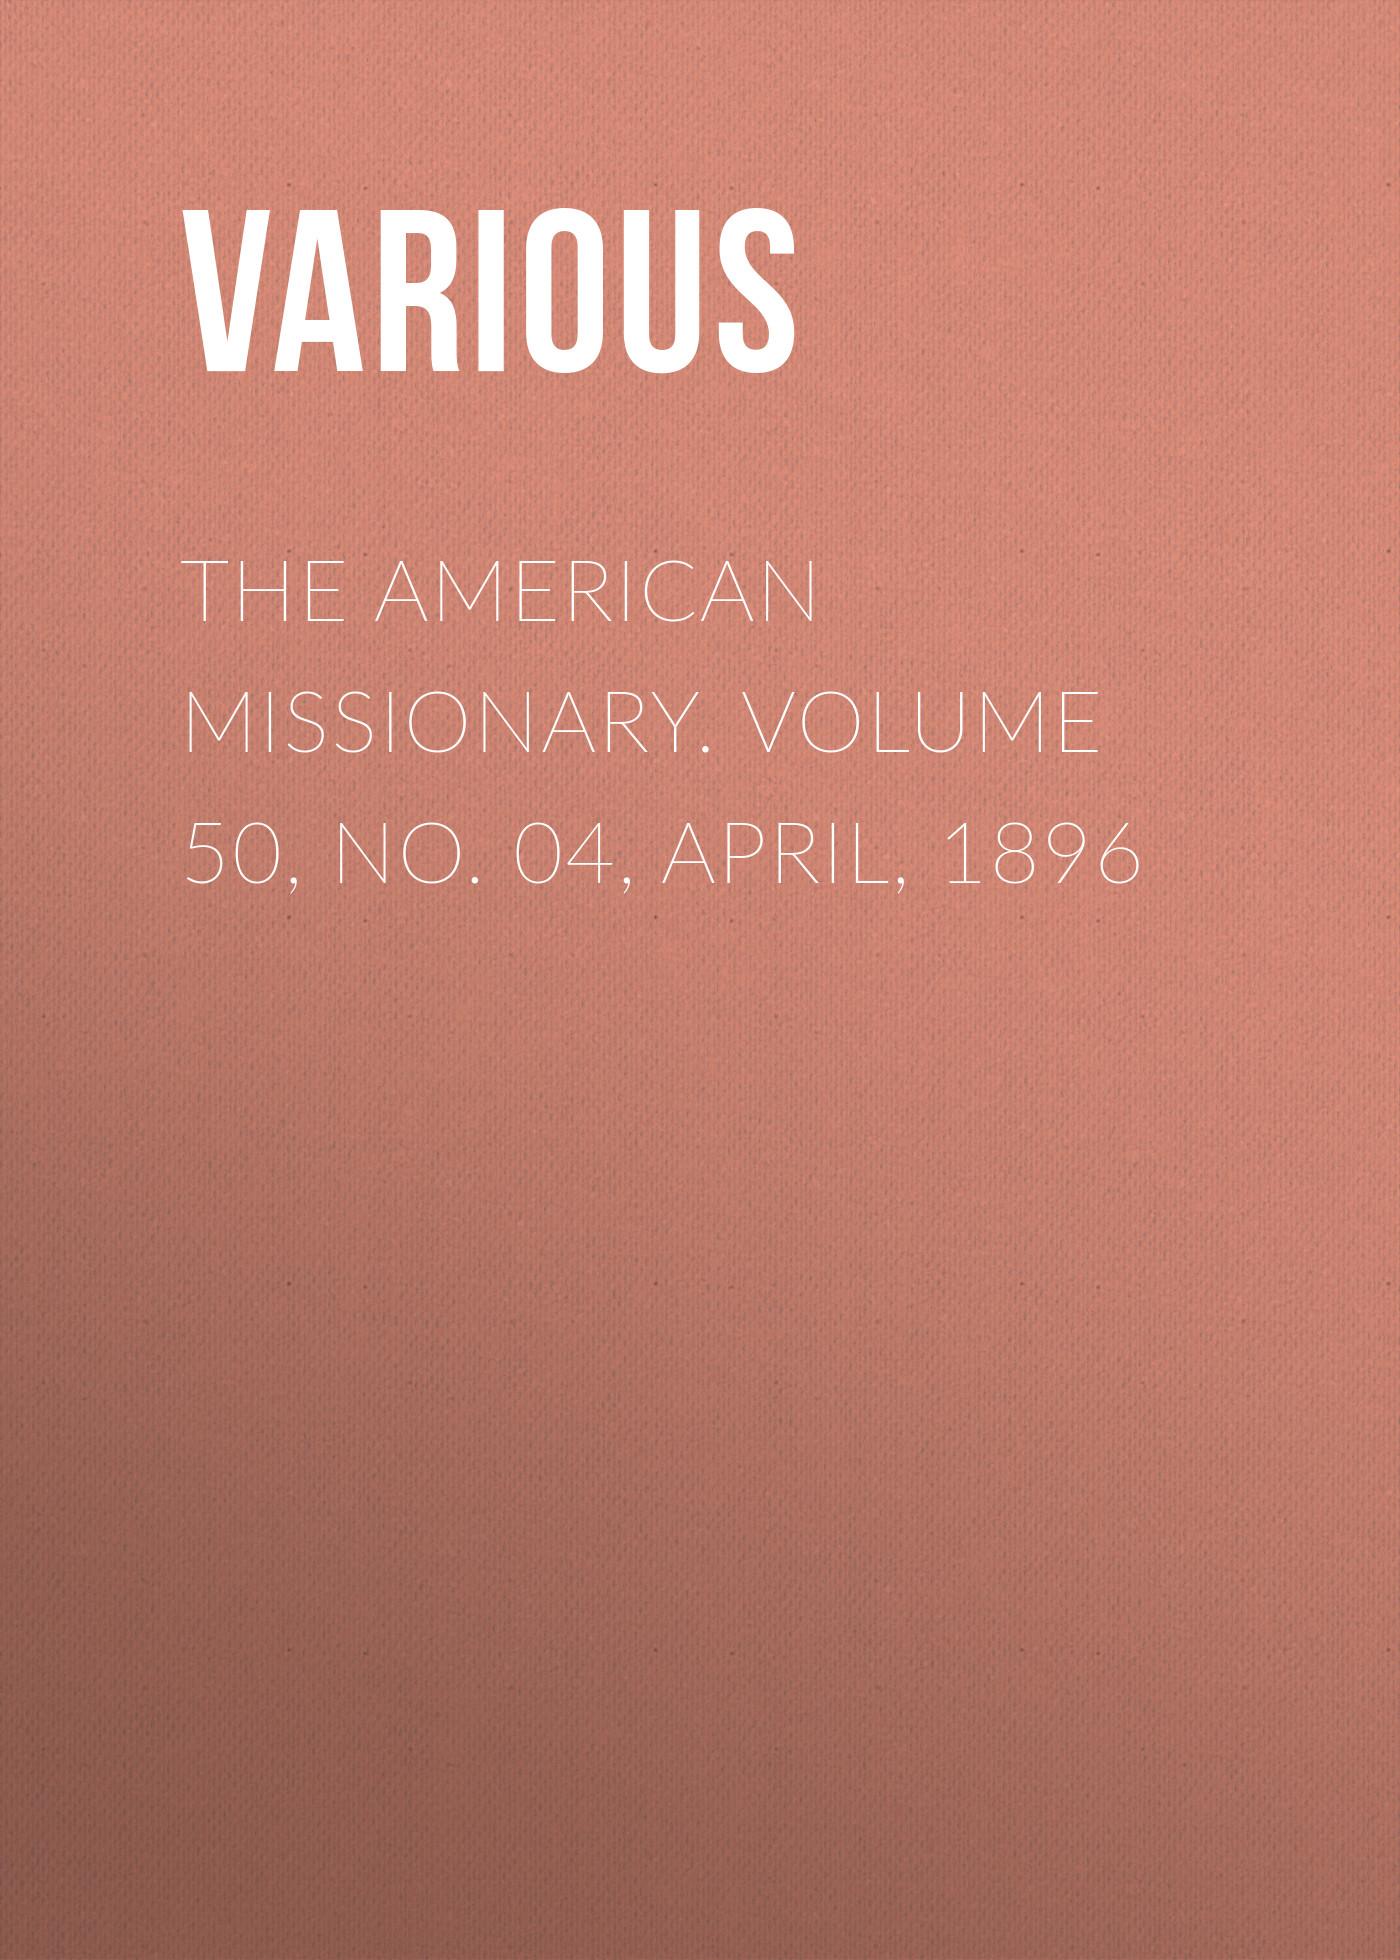 лучшая цена Various The American Missionary. Volume 50, No. 04, April, 1896